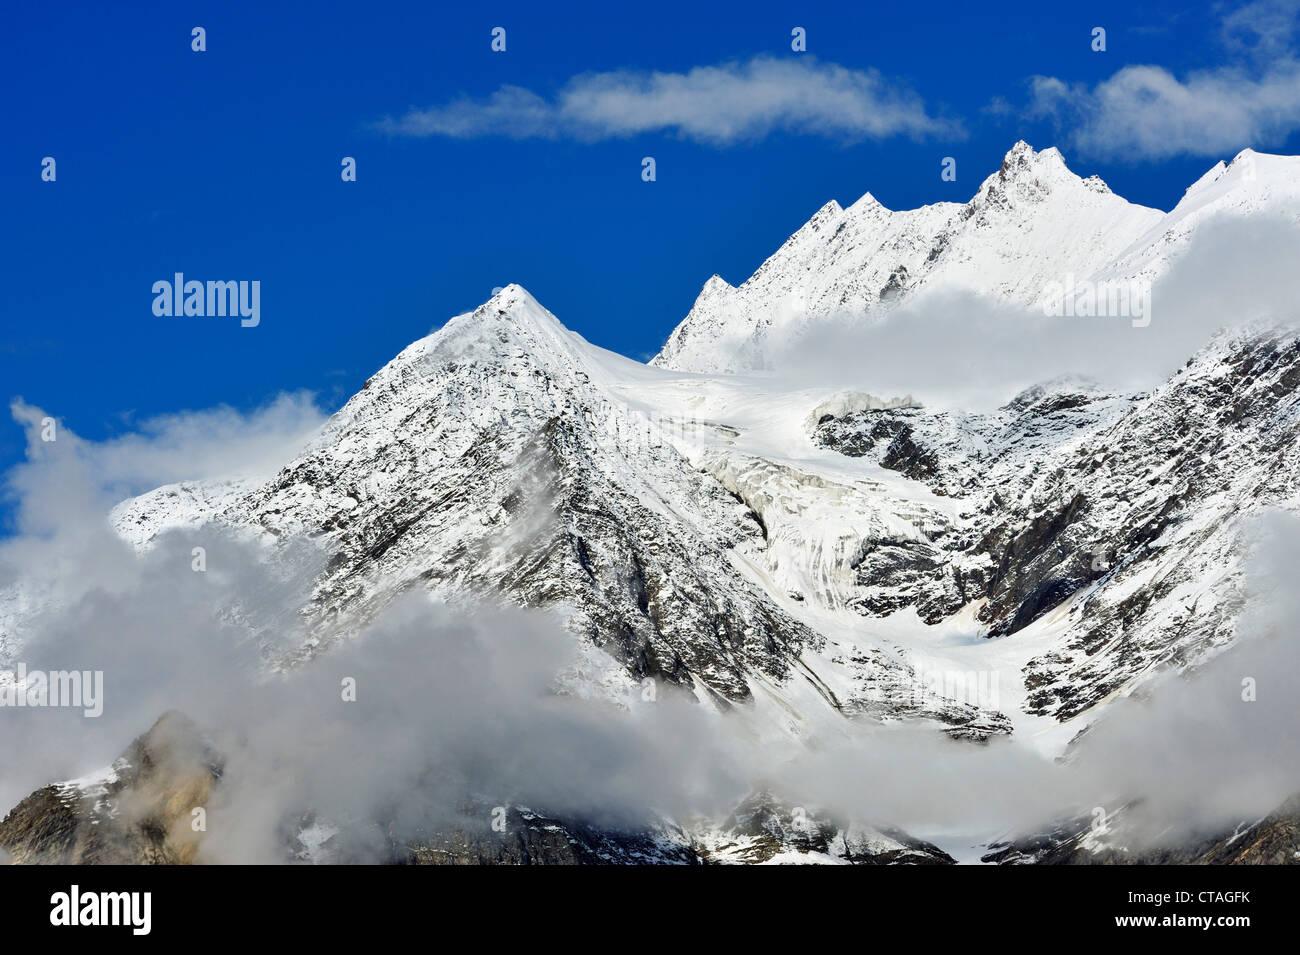 Snow-covered Himalayan mountains above Keylong, Himachal Pradesh, India - Stock Image